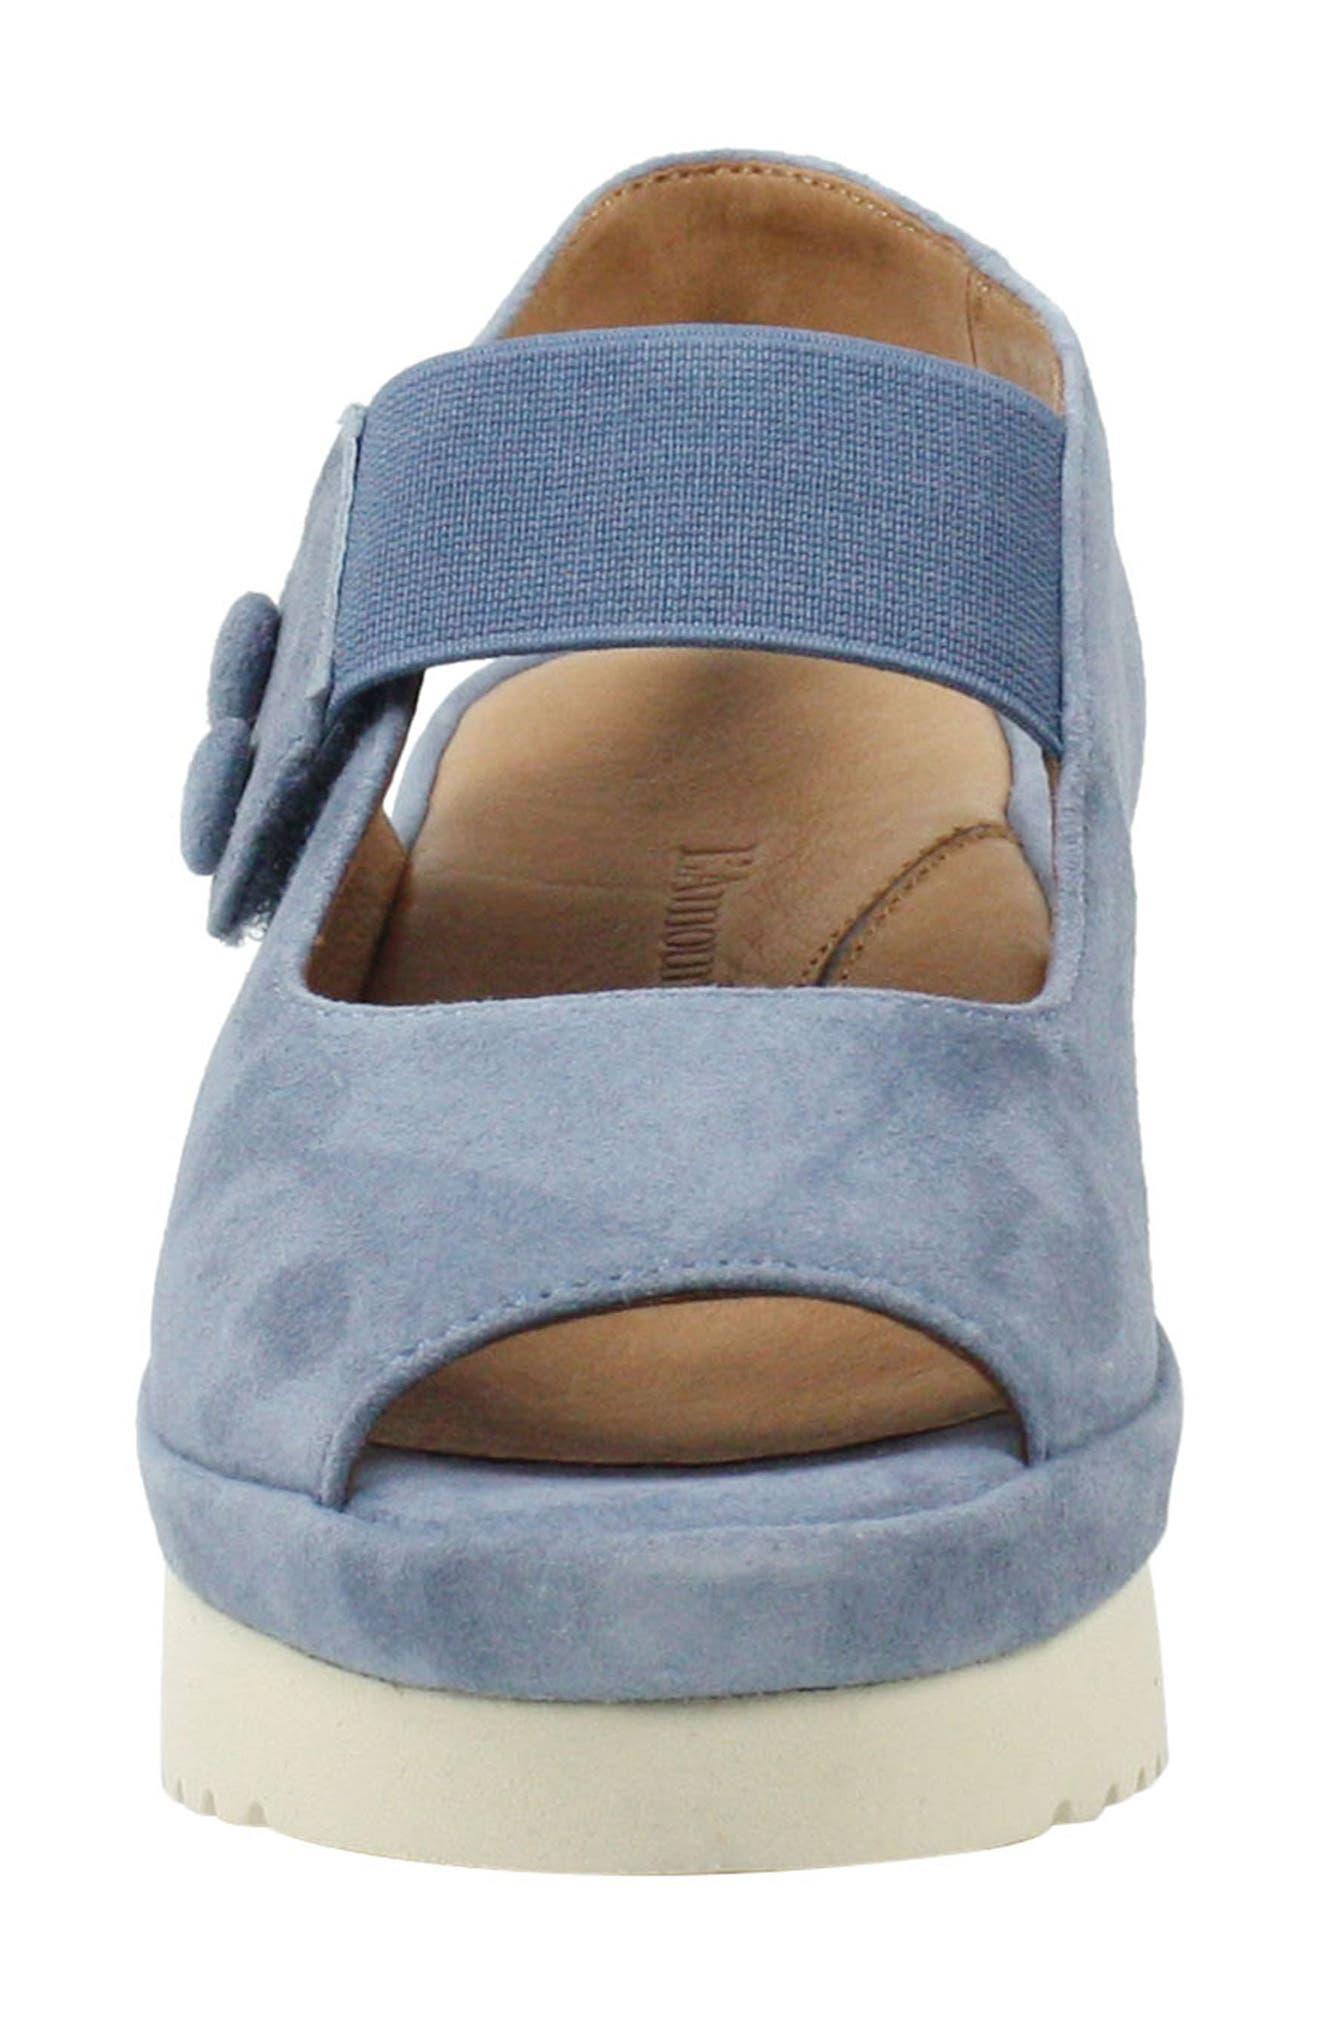 Adalicia Platform Sandal,                             Alternate thumbnail 4, color,                             INK KID SUEDE